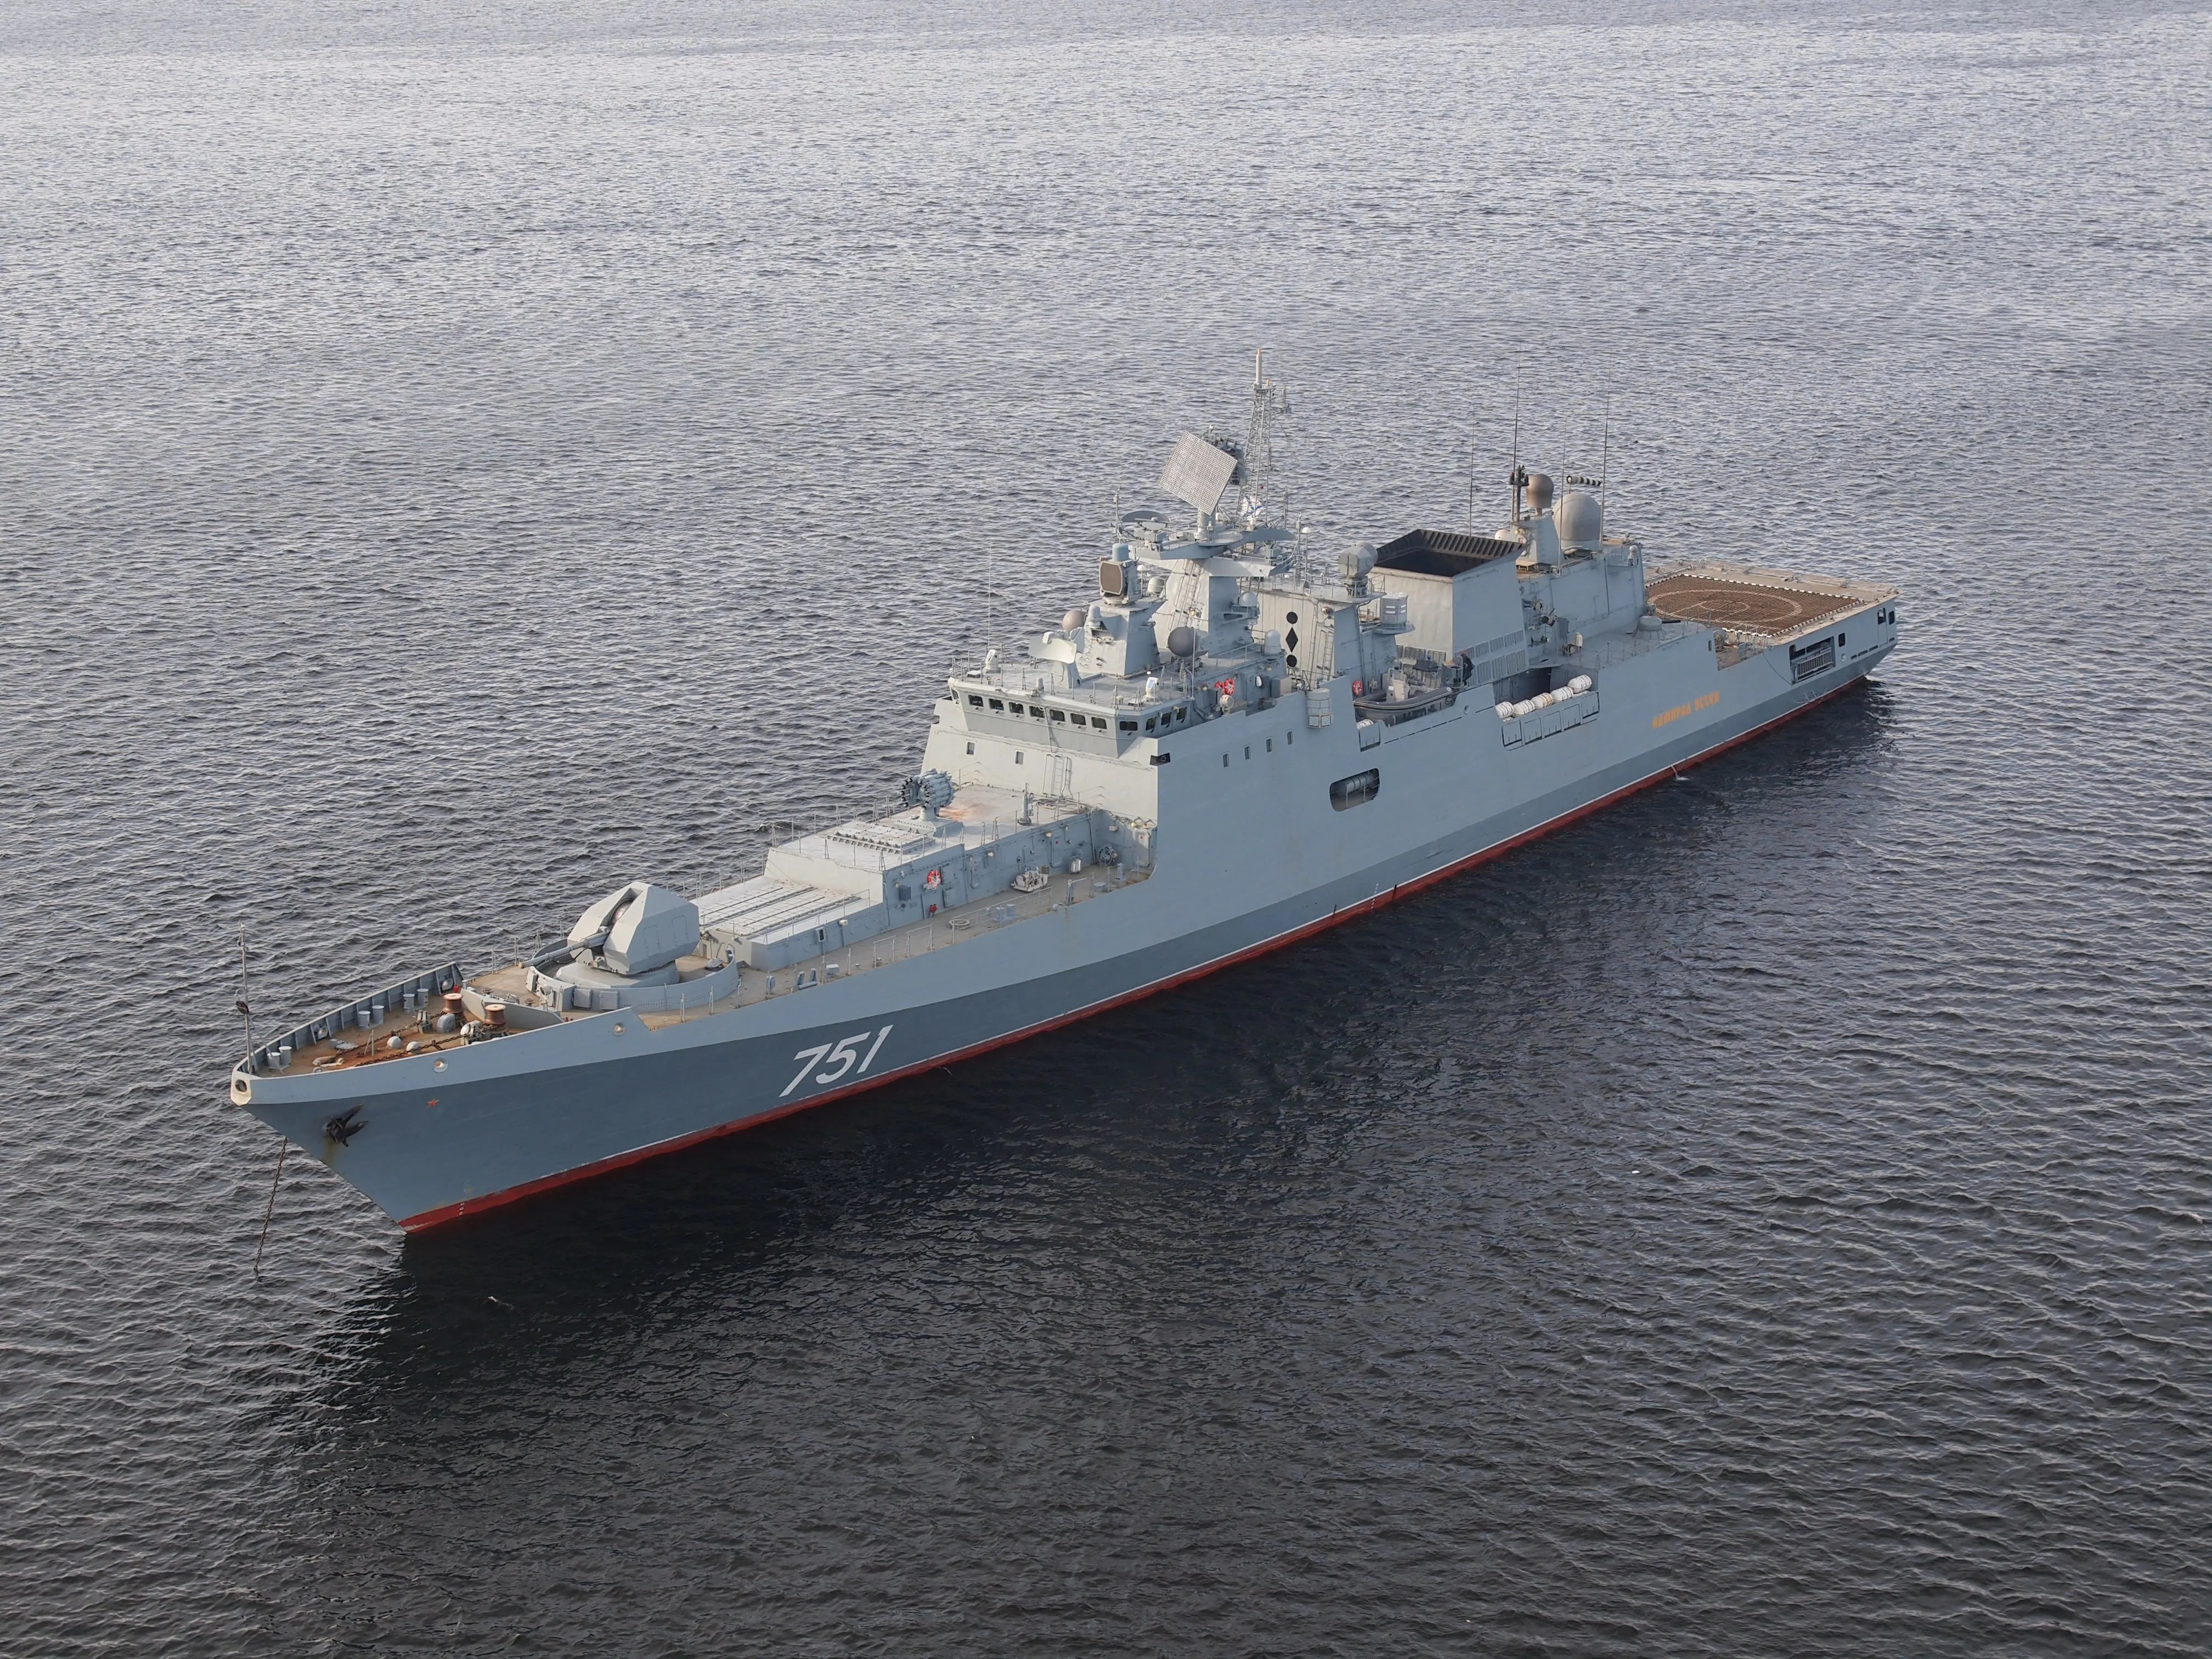 A Russian Navy Grigorovich-class frigate underway.